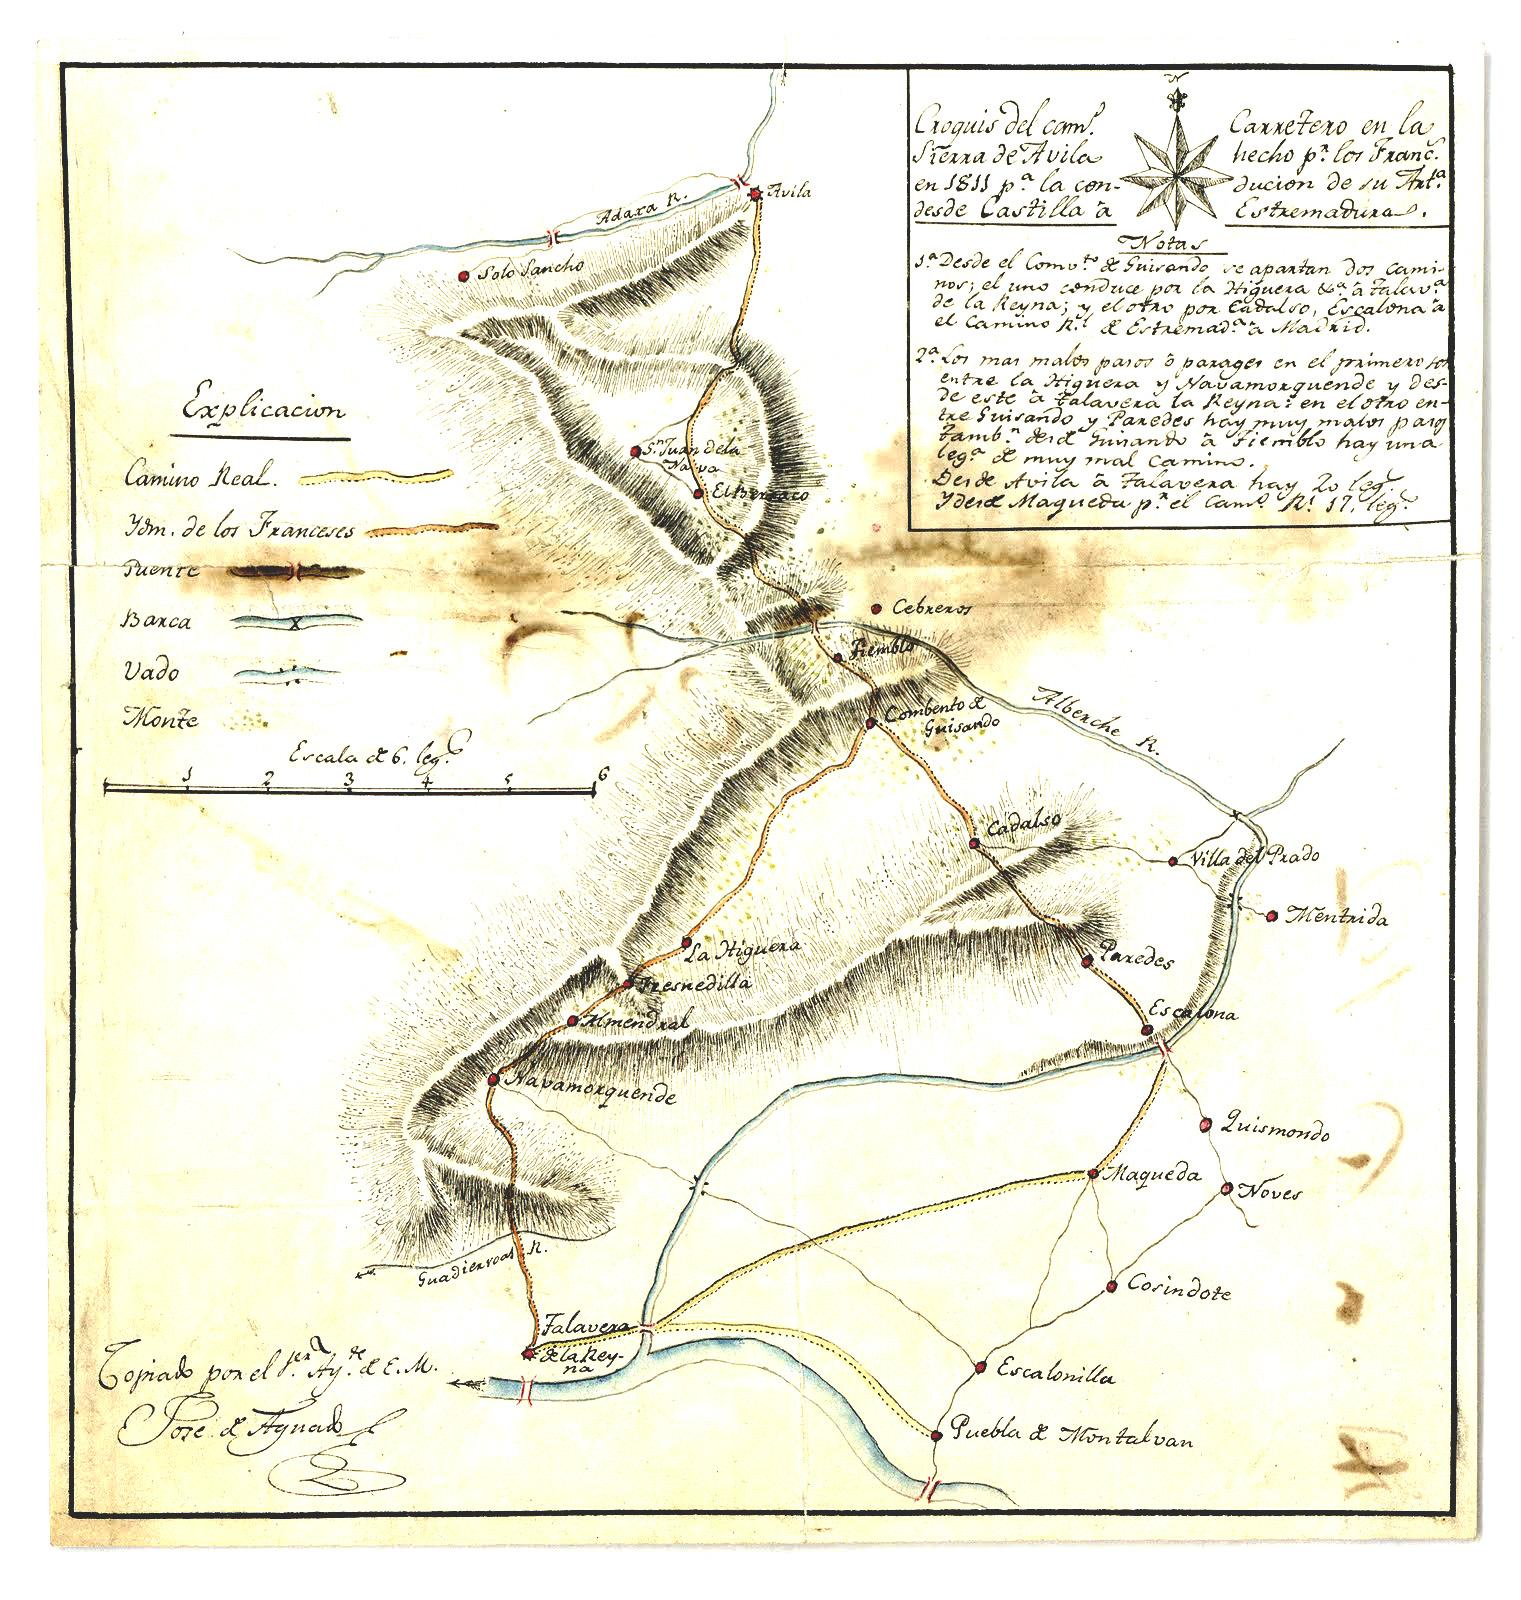 Imagen de Paredes de Escalona mapa 45908 4